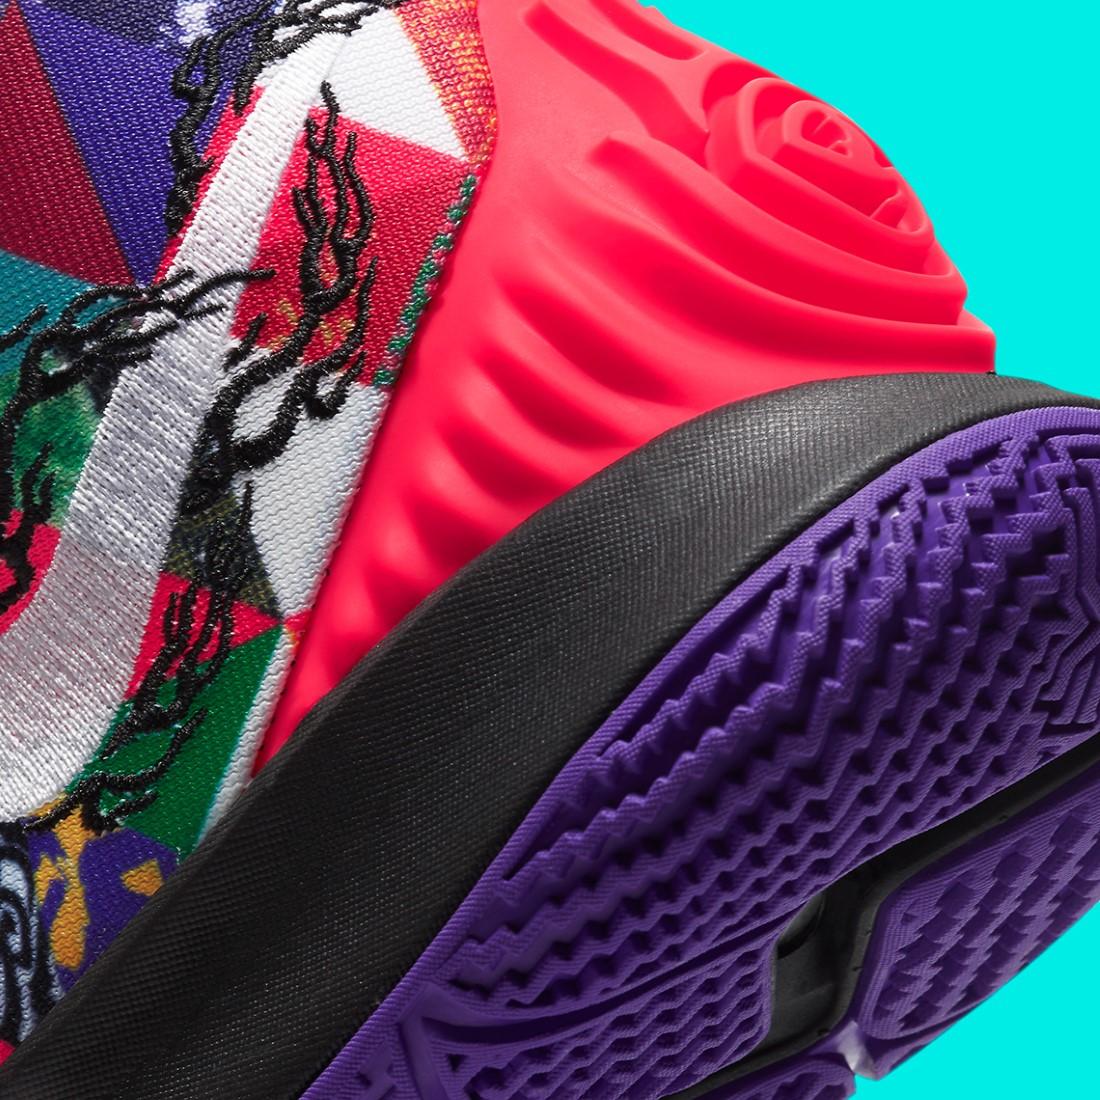 Nike Kyrie S2 Lunar New Year 2021